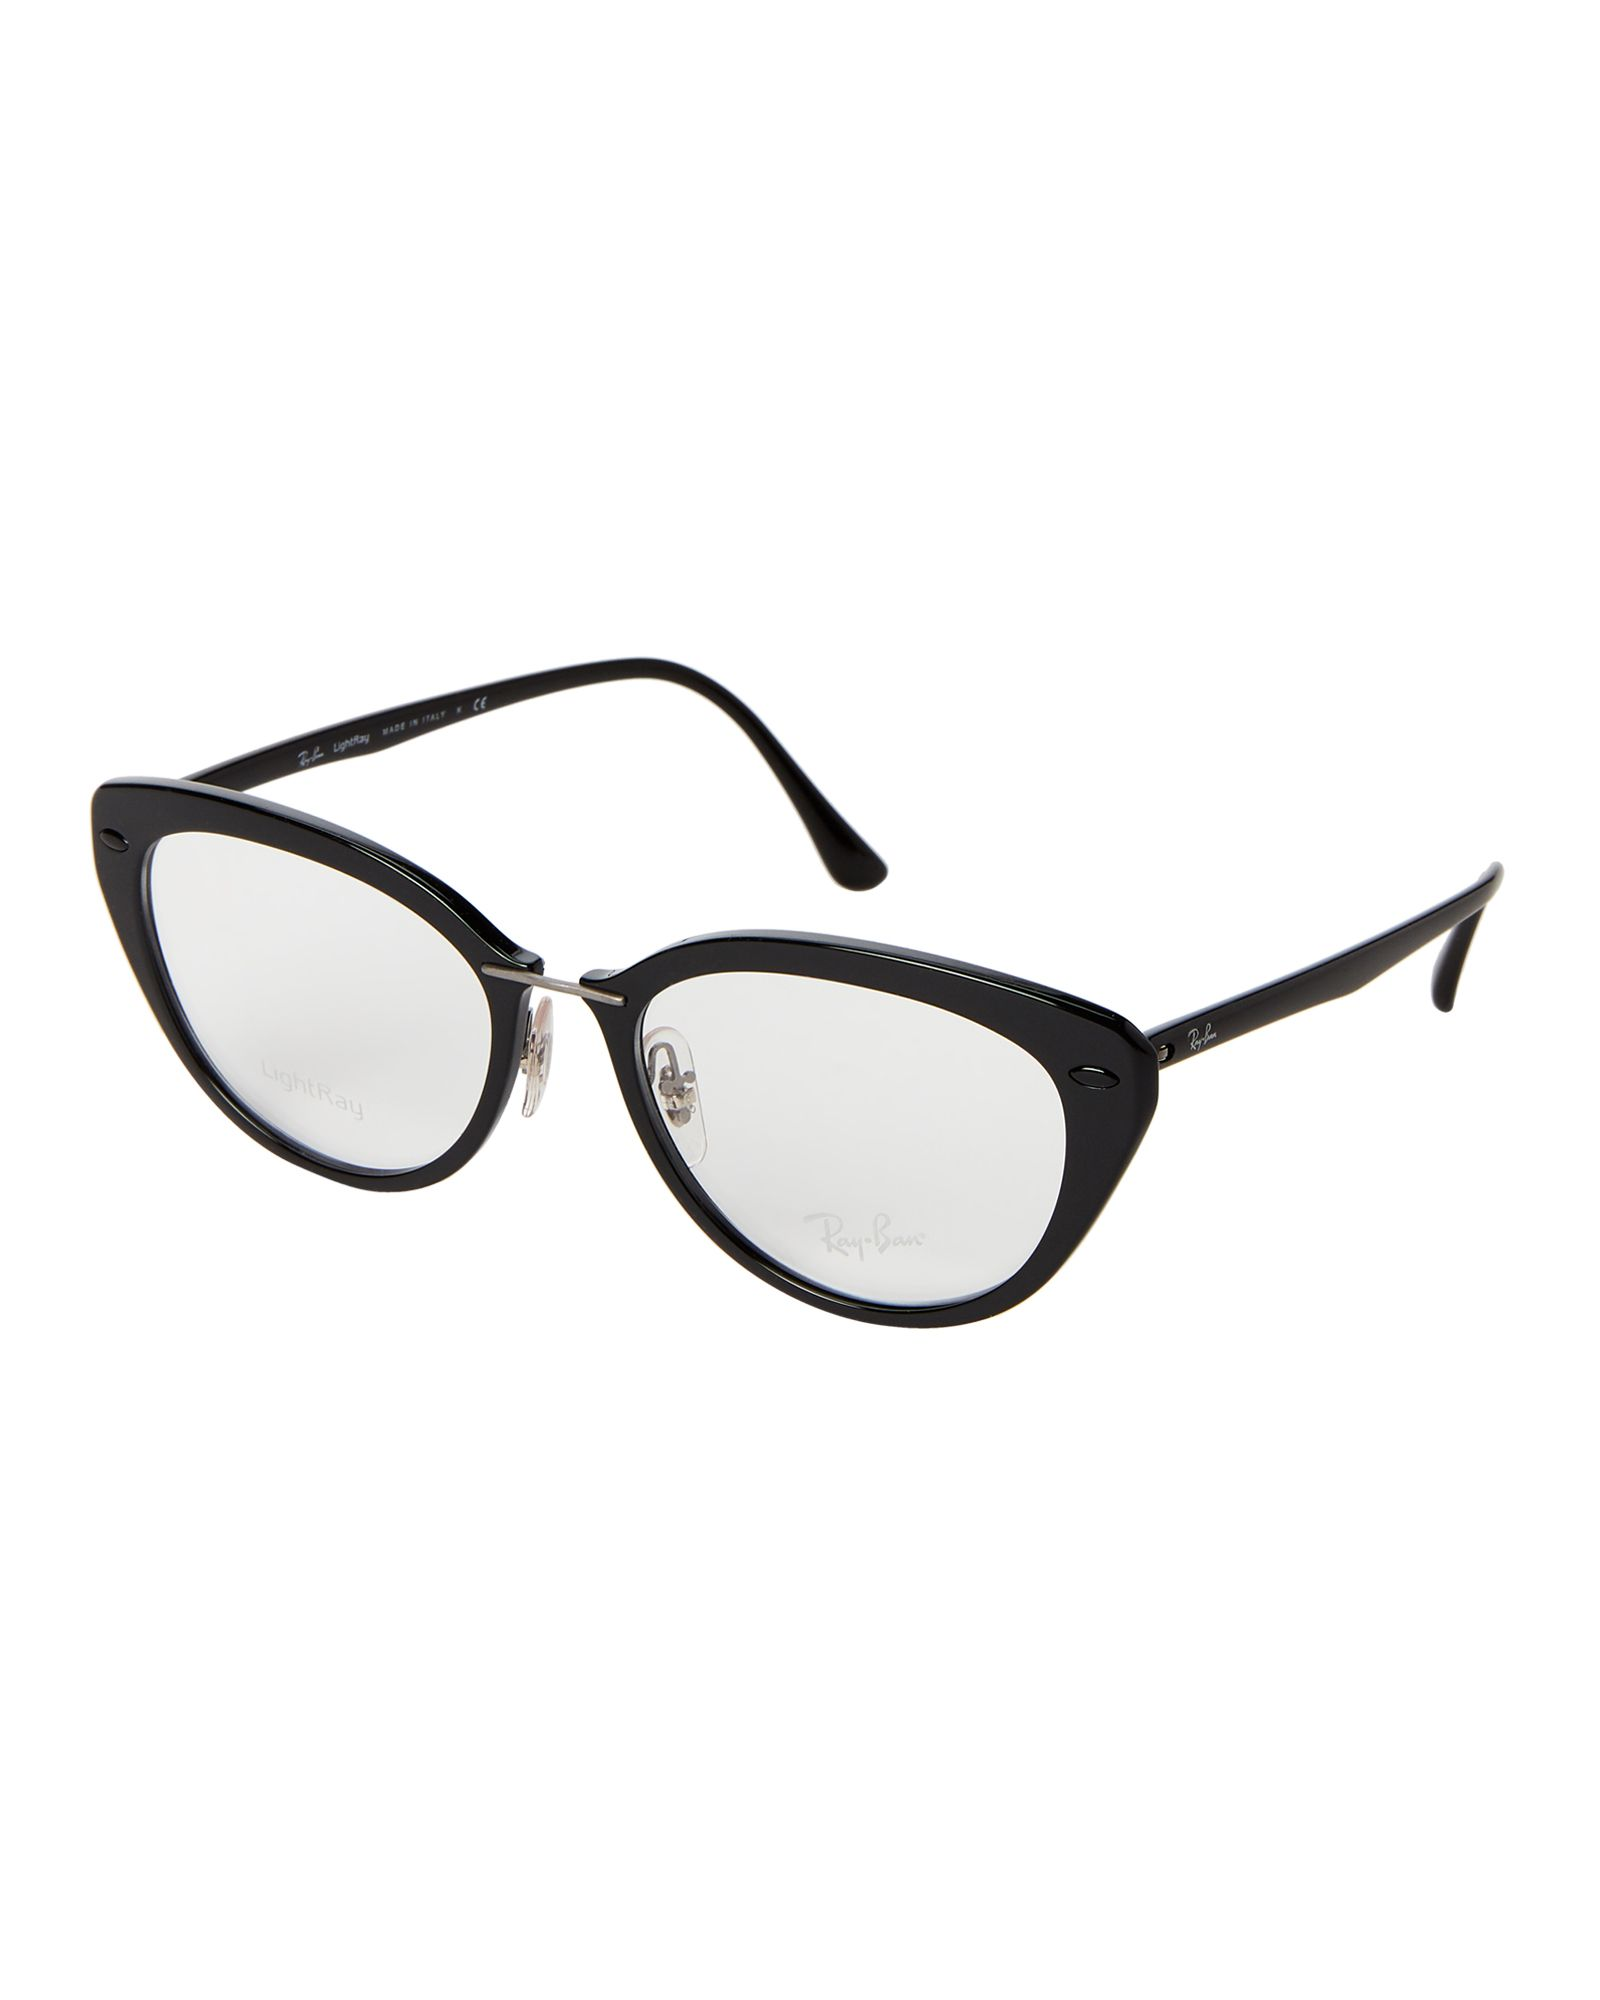 ba73a54651 RB 7088 Black Cat Eye Optical Frames in 2019